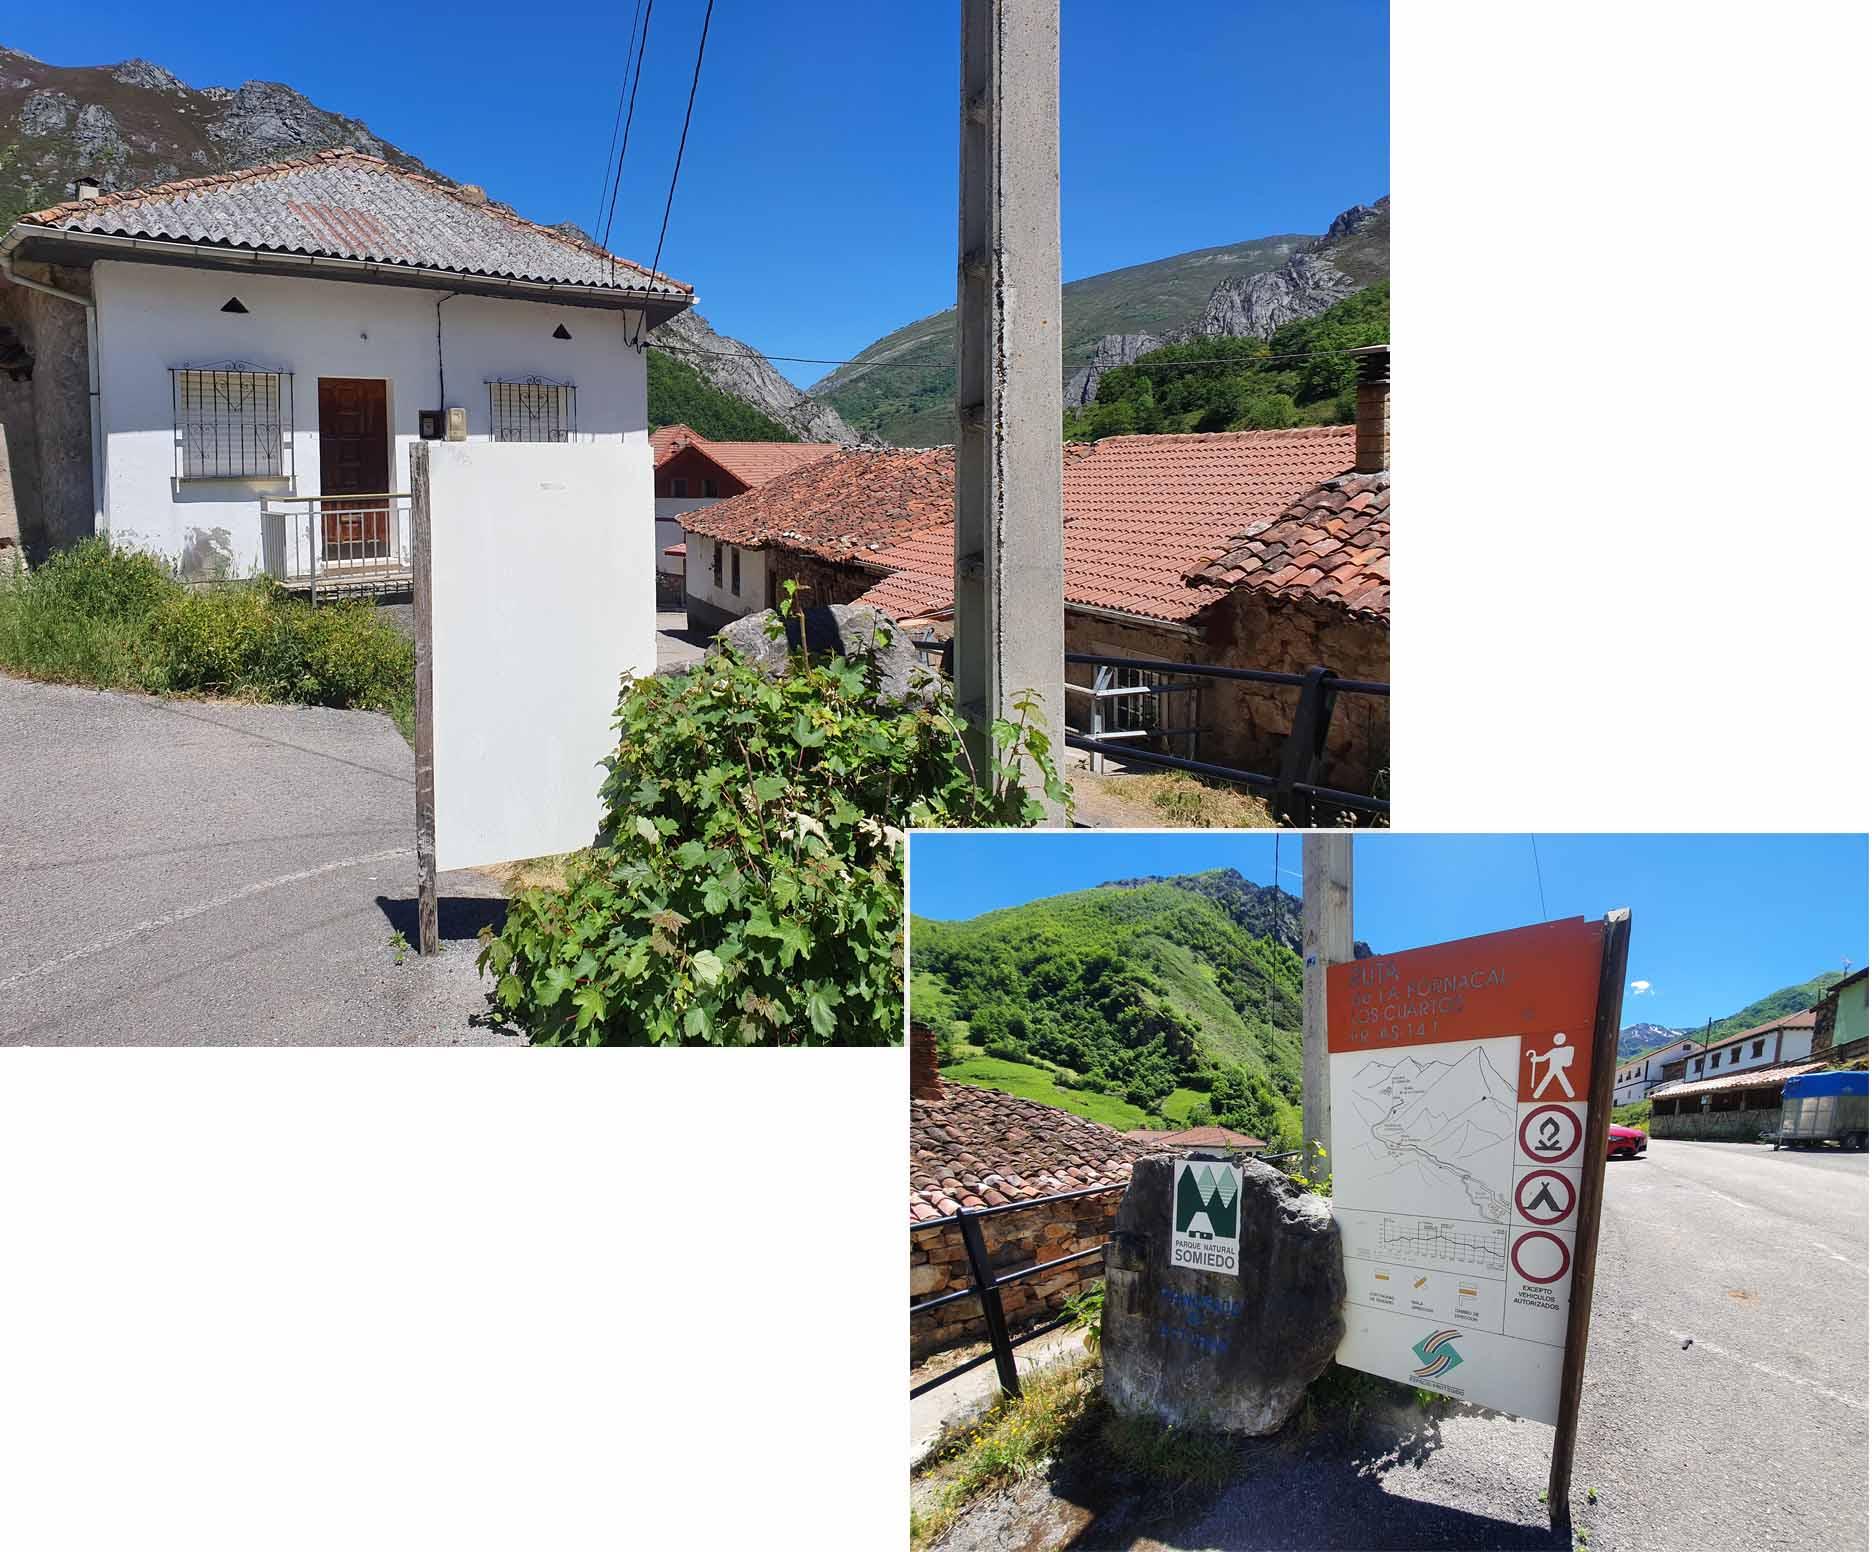 Public carpark at village Villar de Vildas